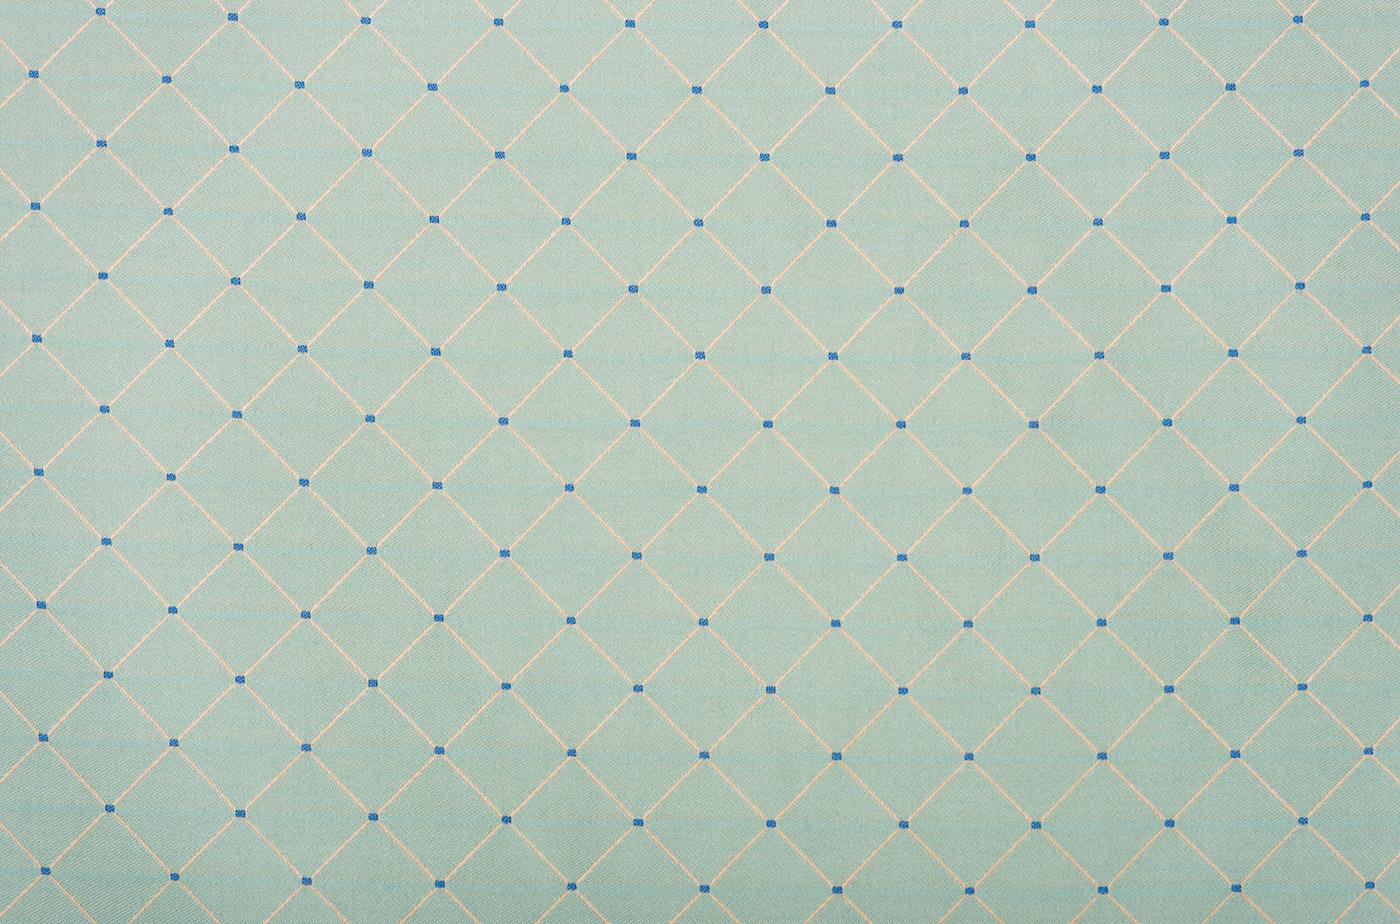 Embellished Diamond Spa 10009 03